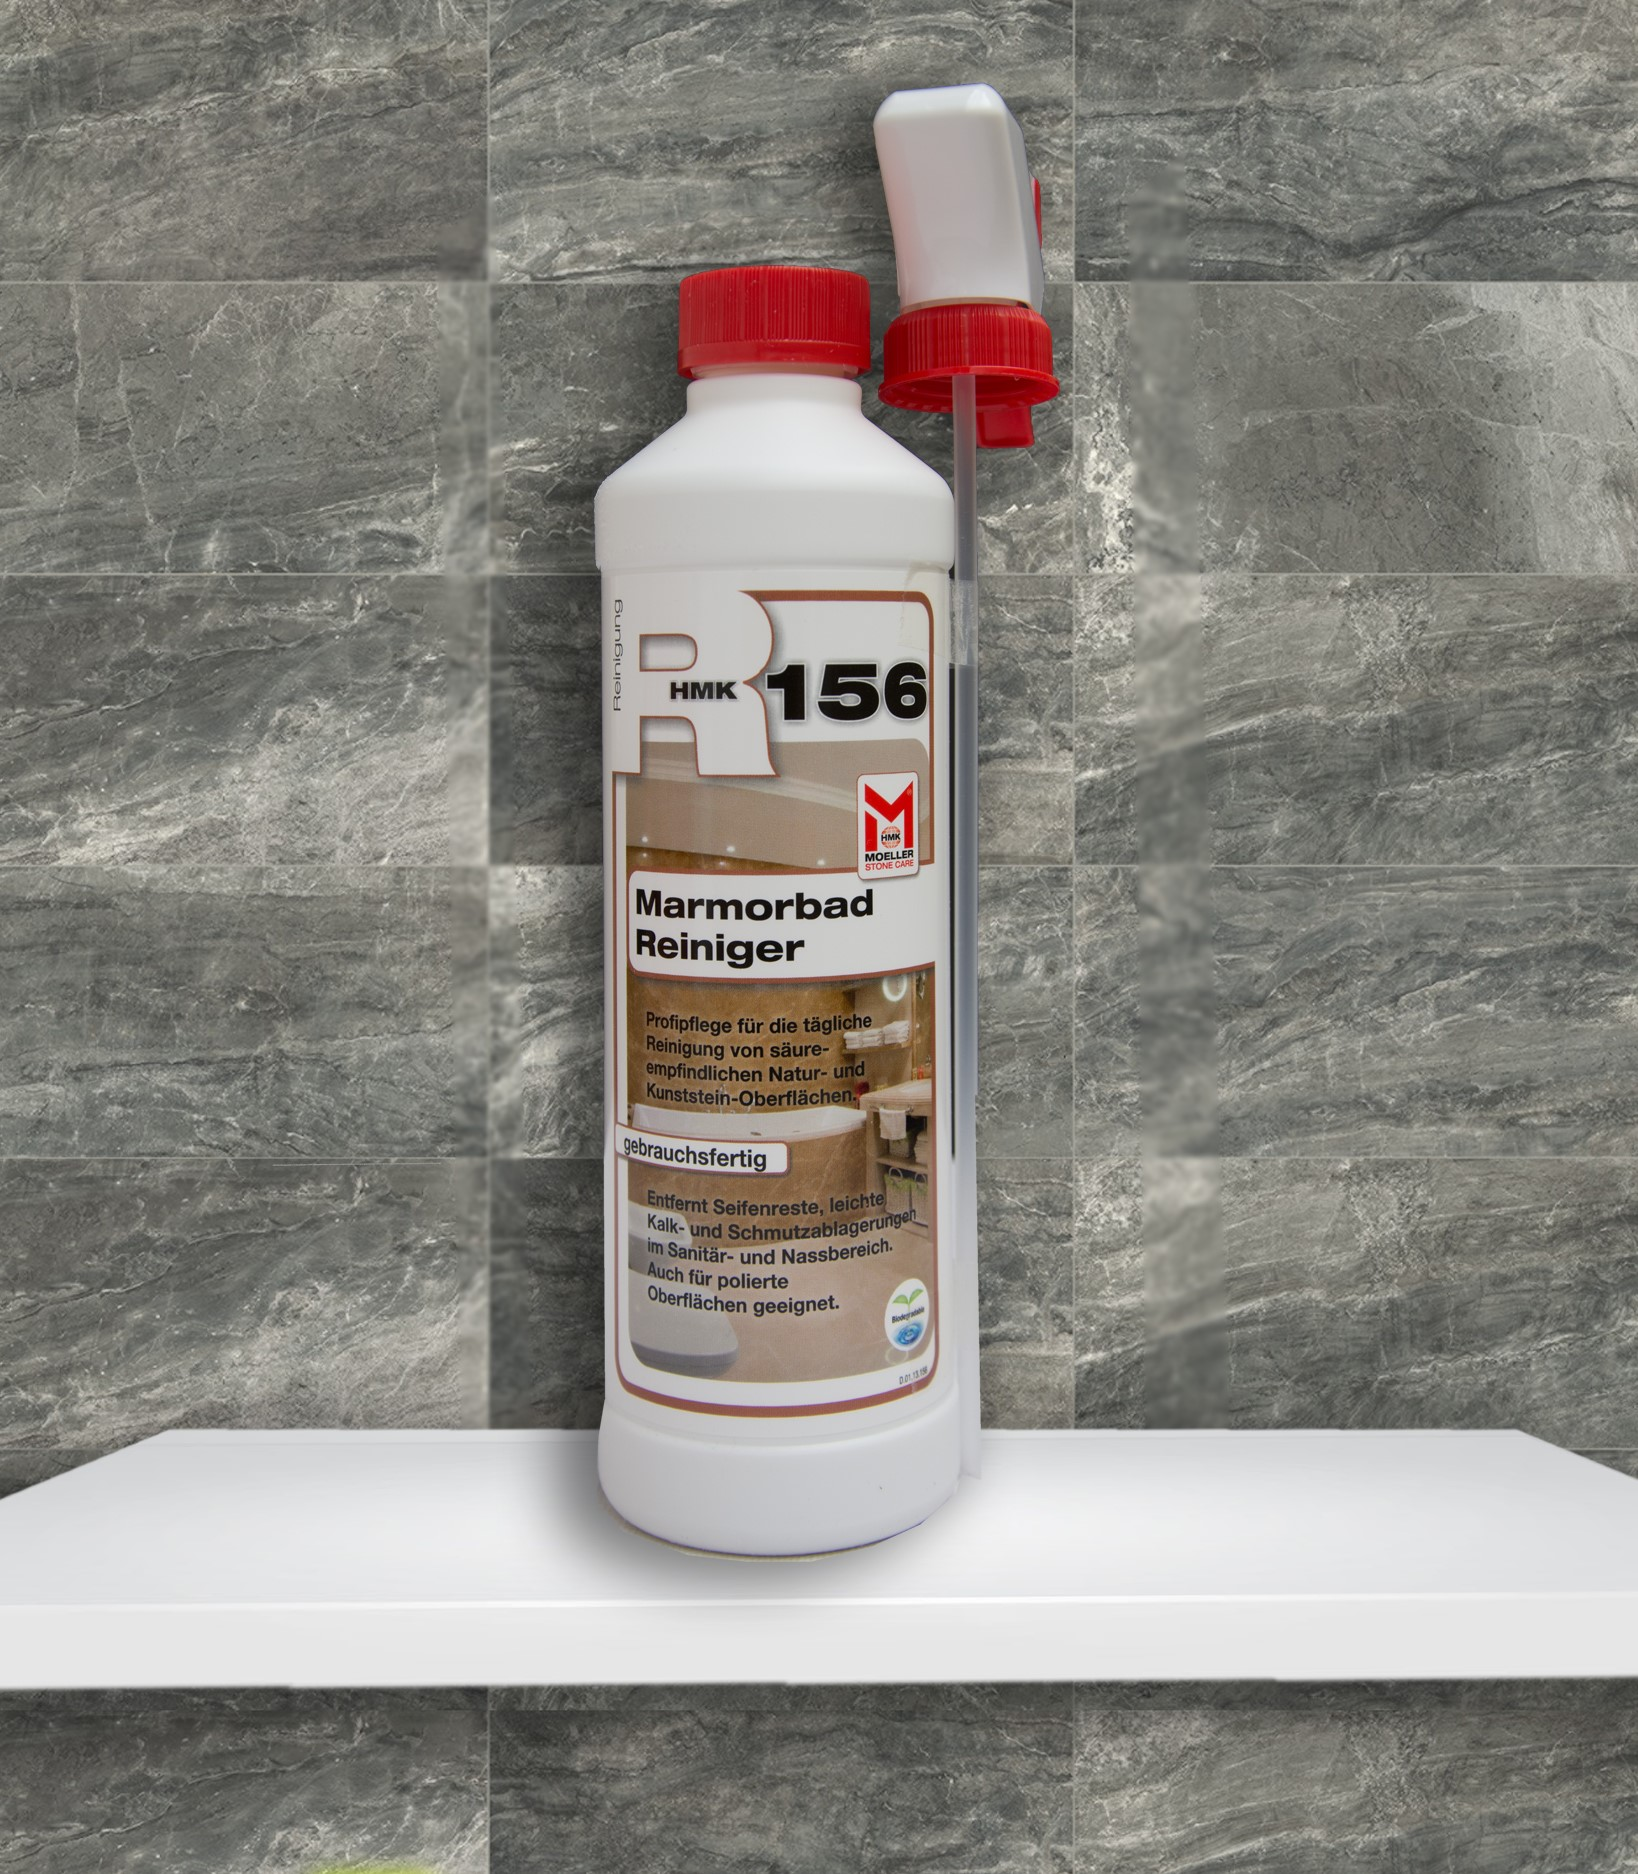 HMK R156 Marmorbad-Reiniger 500ml